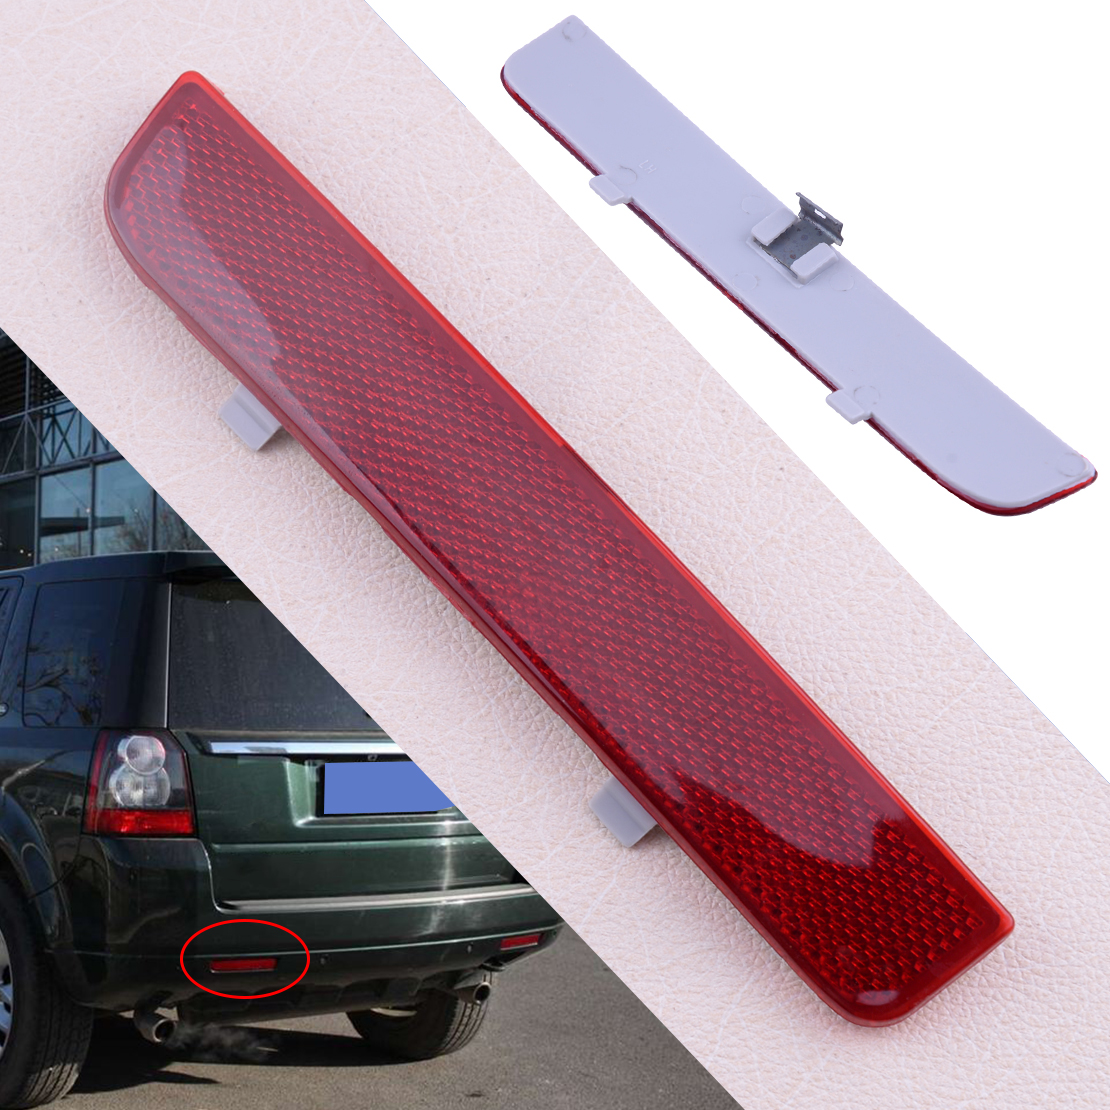 2010 Land Rover Lr2 Exterior: CITALL Rear Left Red Car Bumper Reflector LR006349 Fit For